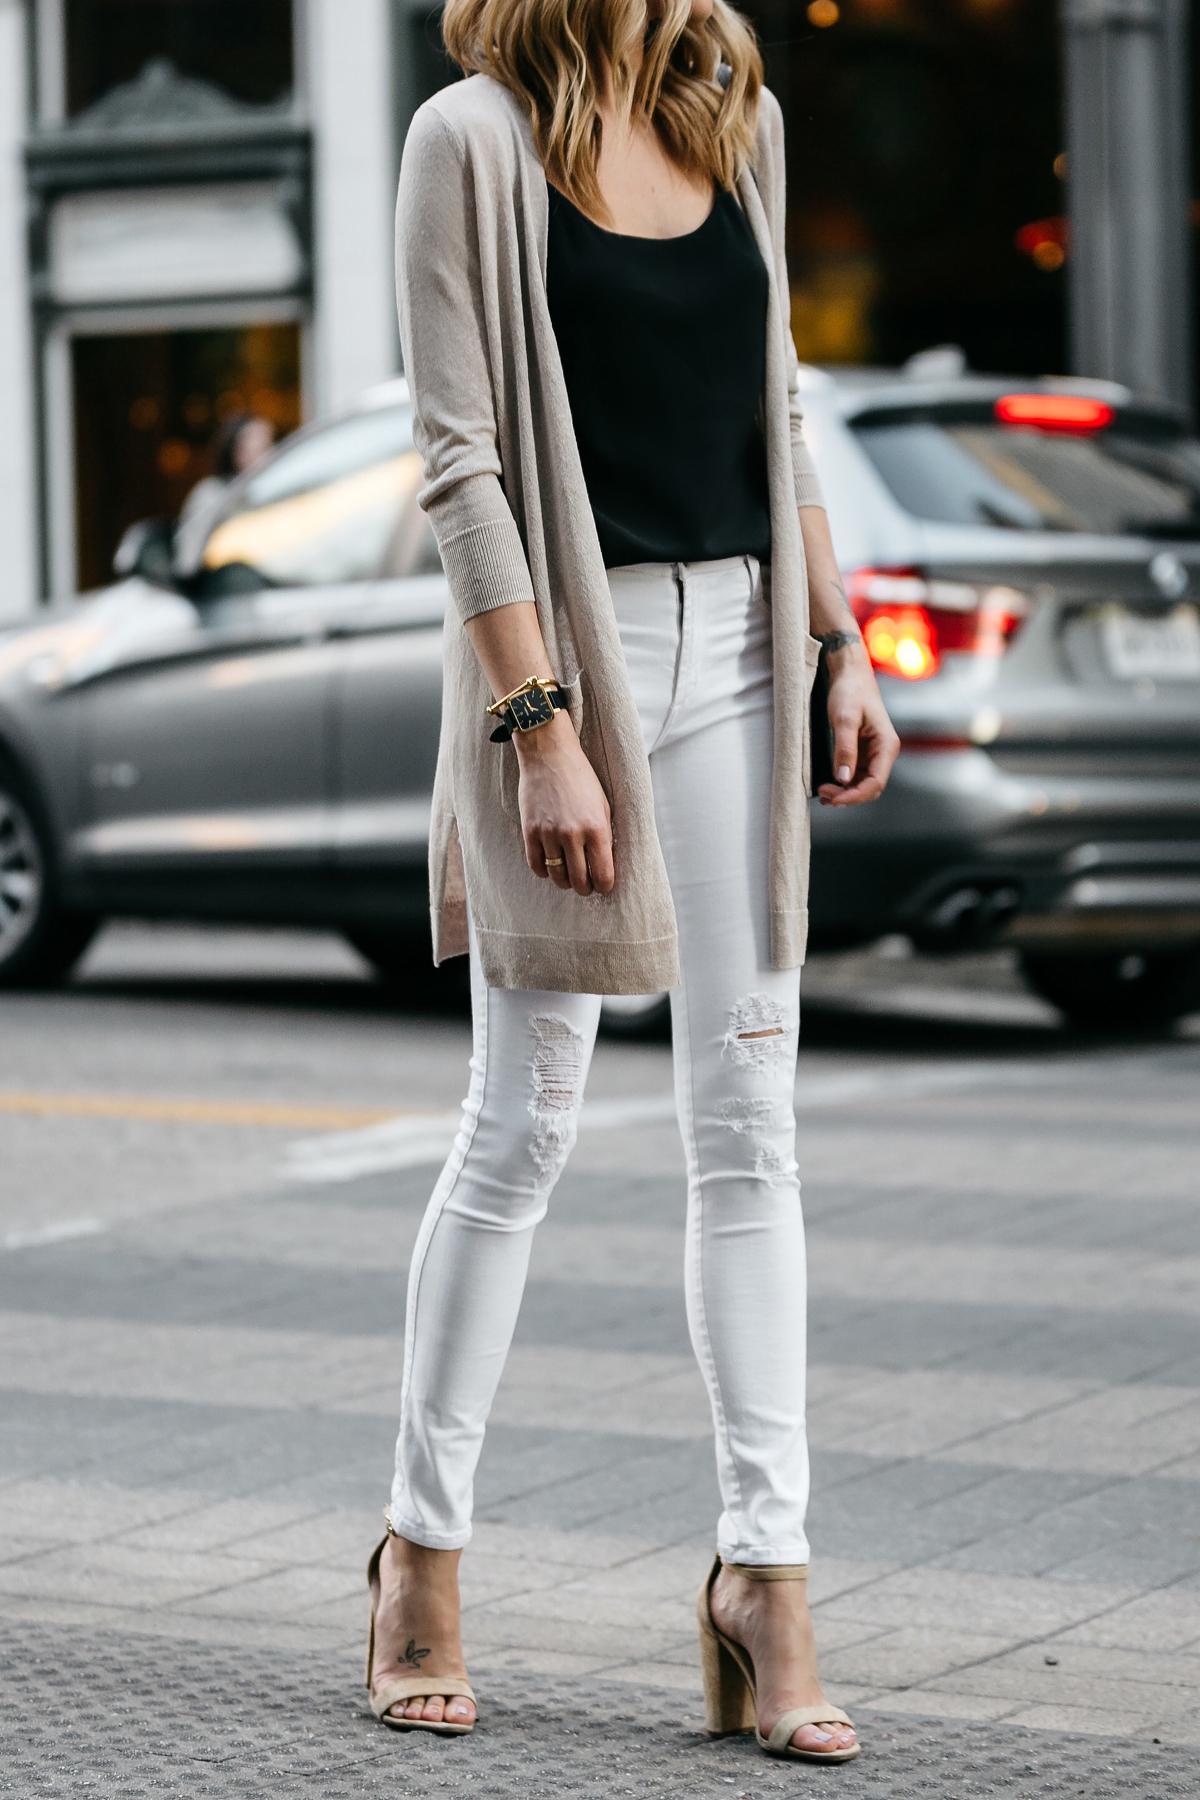 Fashion Jackson, Dallas Blogger, Fashion Blogger, Street Style, Long Beige Cardigan, Black Cami Tank, White Ripped Skinny Jeans, Chloe Faye Handbag, Tan Ankle Strap Heeled Sandals